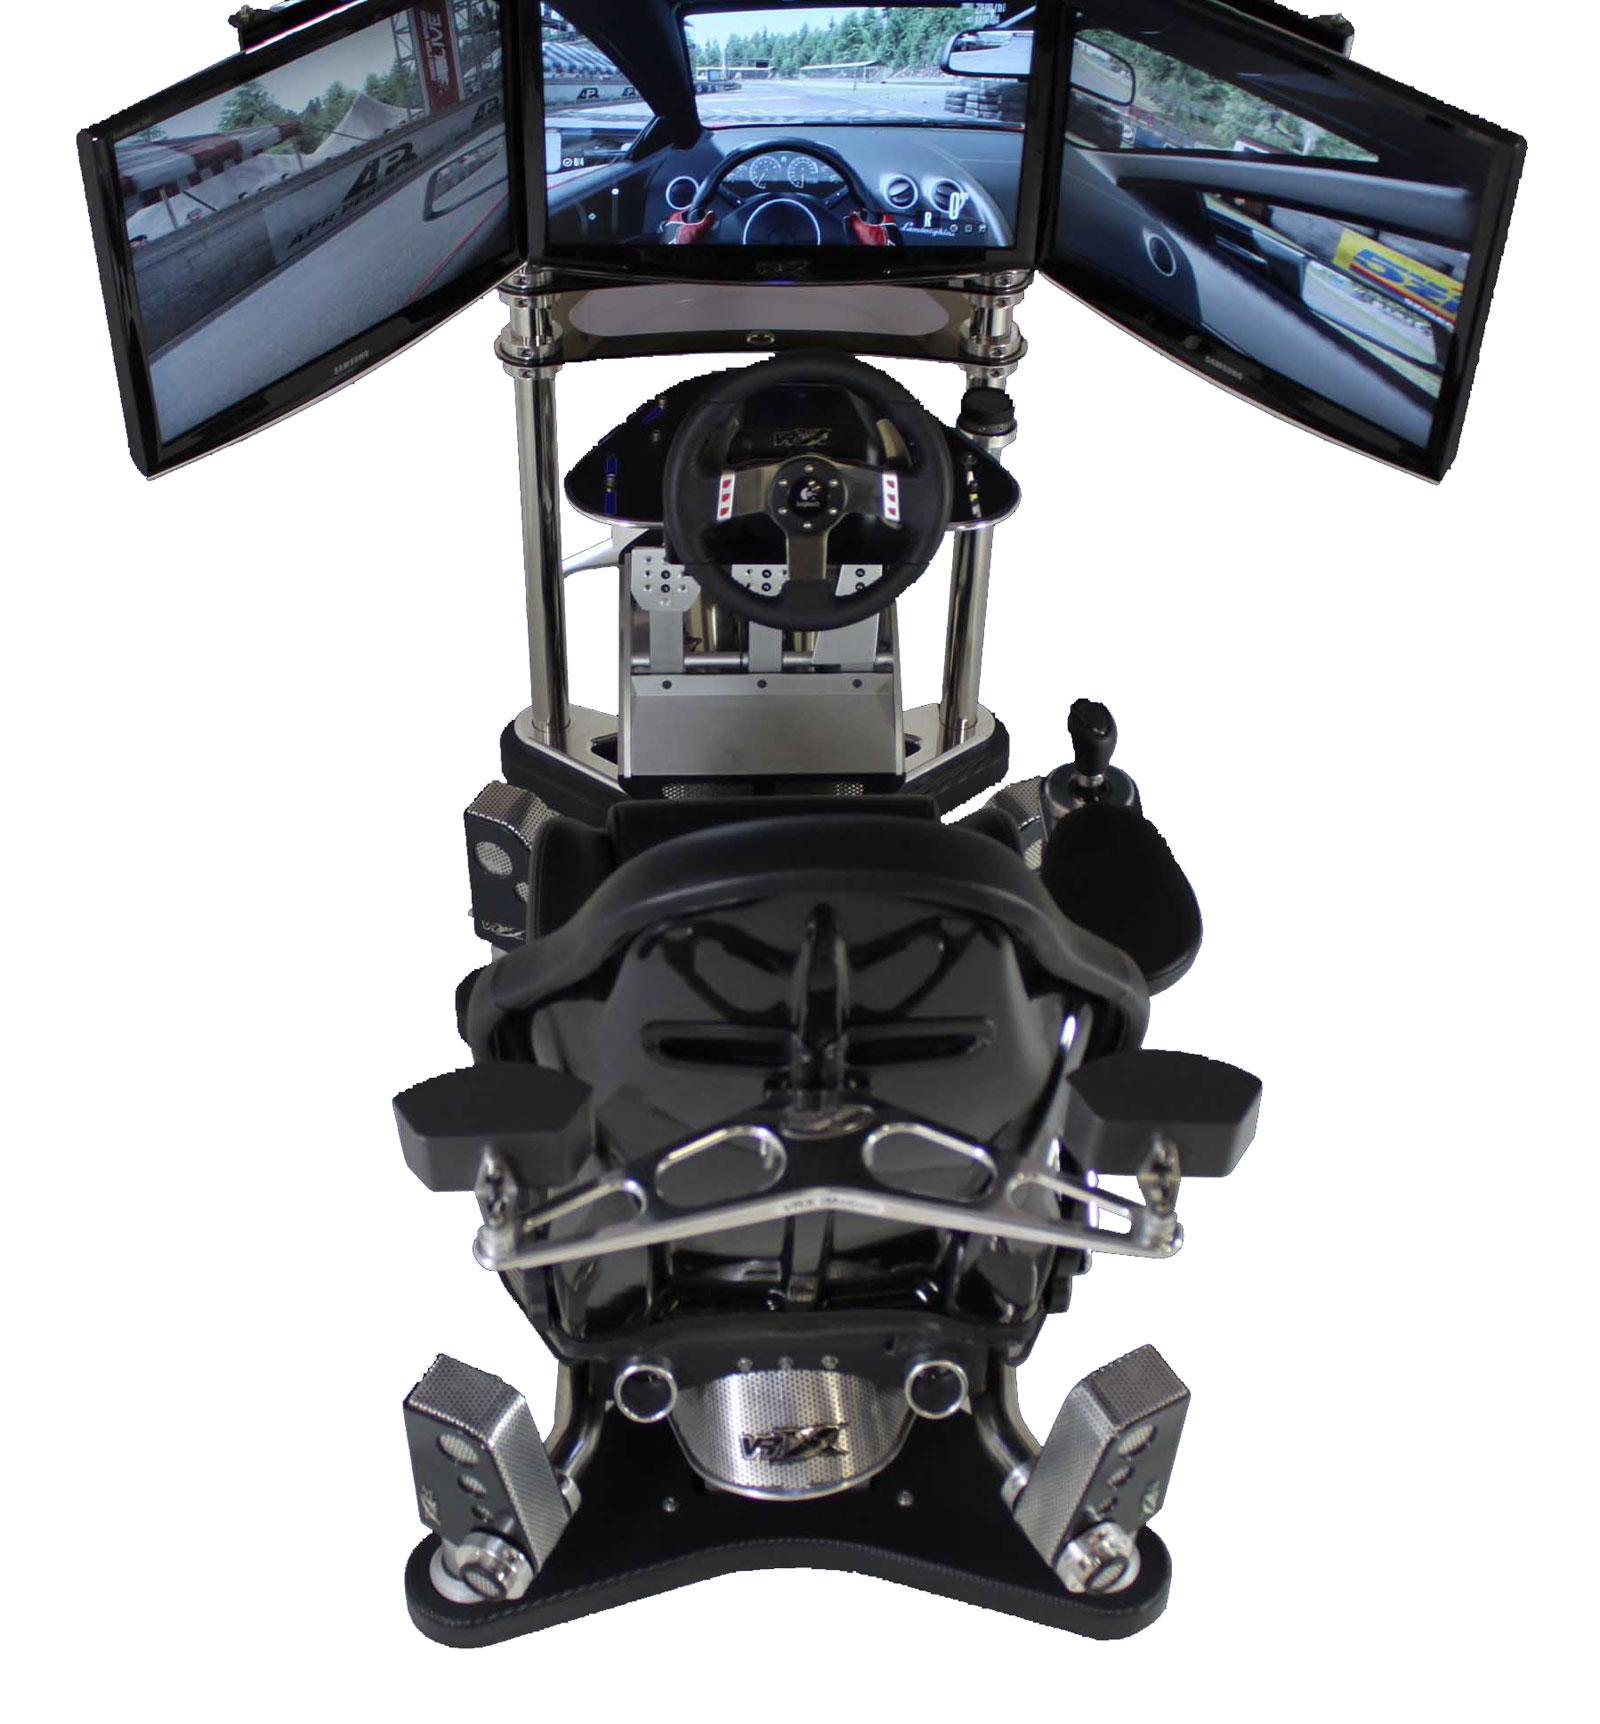 VRX iMotion 3D Full Motion Racing Simulator